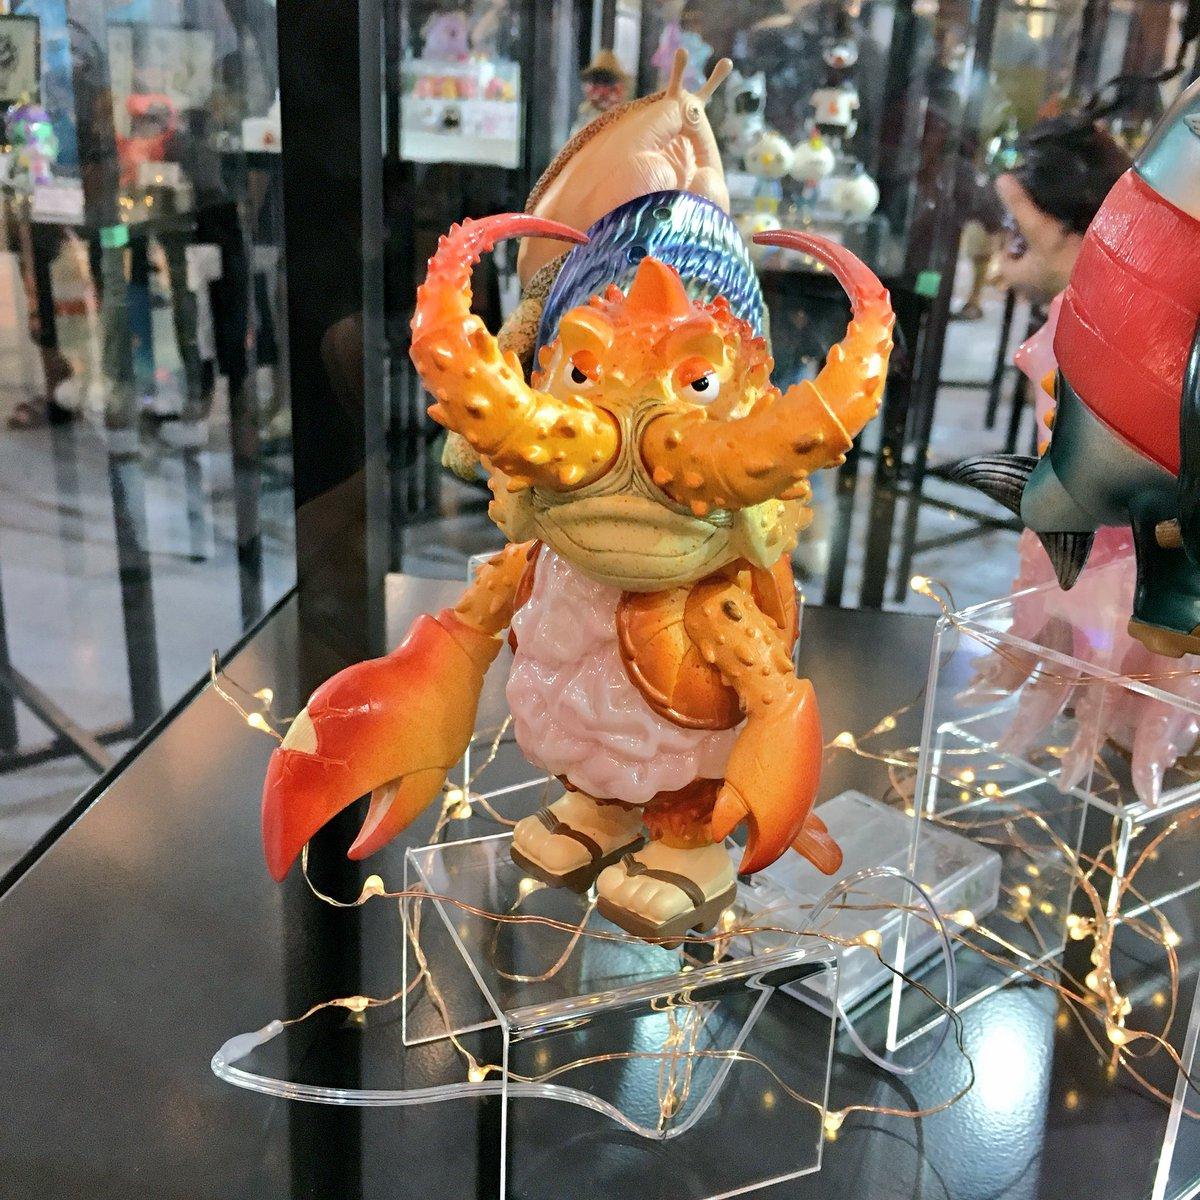 Thailand toy expo 2018... (5)  Photo by myself   #ThailandToyExpo2018 #TTE2018 https://t.co/jN2UA5FfCv